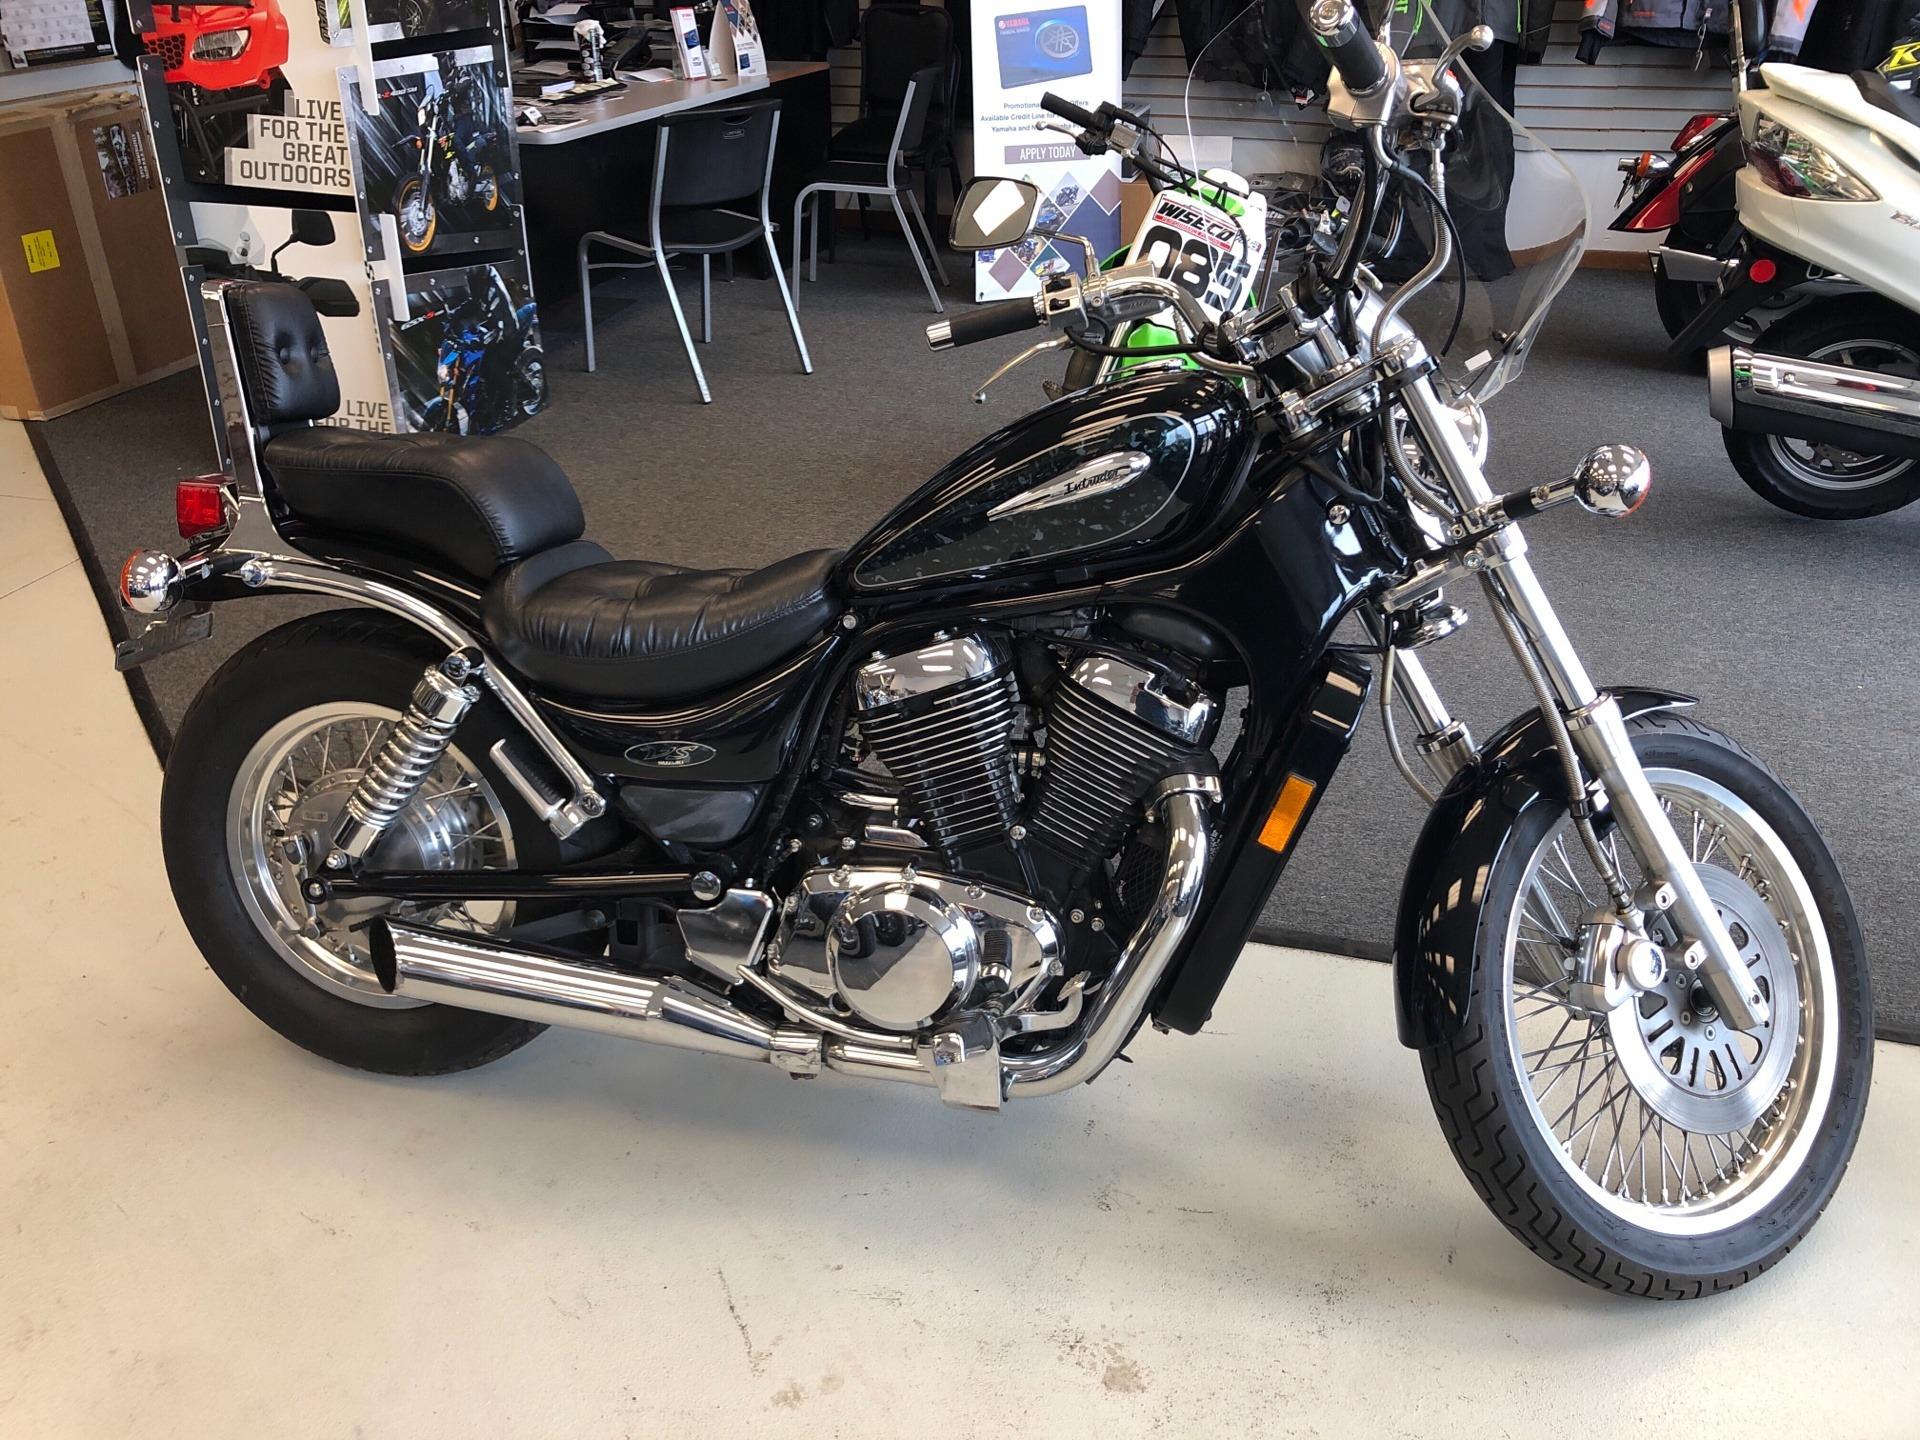 used 2000 suzuki intruder 800 motorcycles in elkhart in stock number 100403. Black Bedroom Furniture Sets. Home Design Ideas